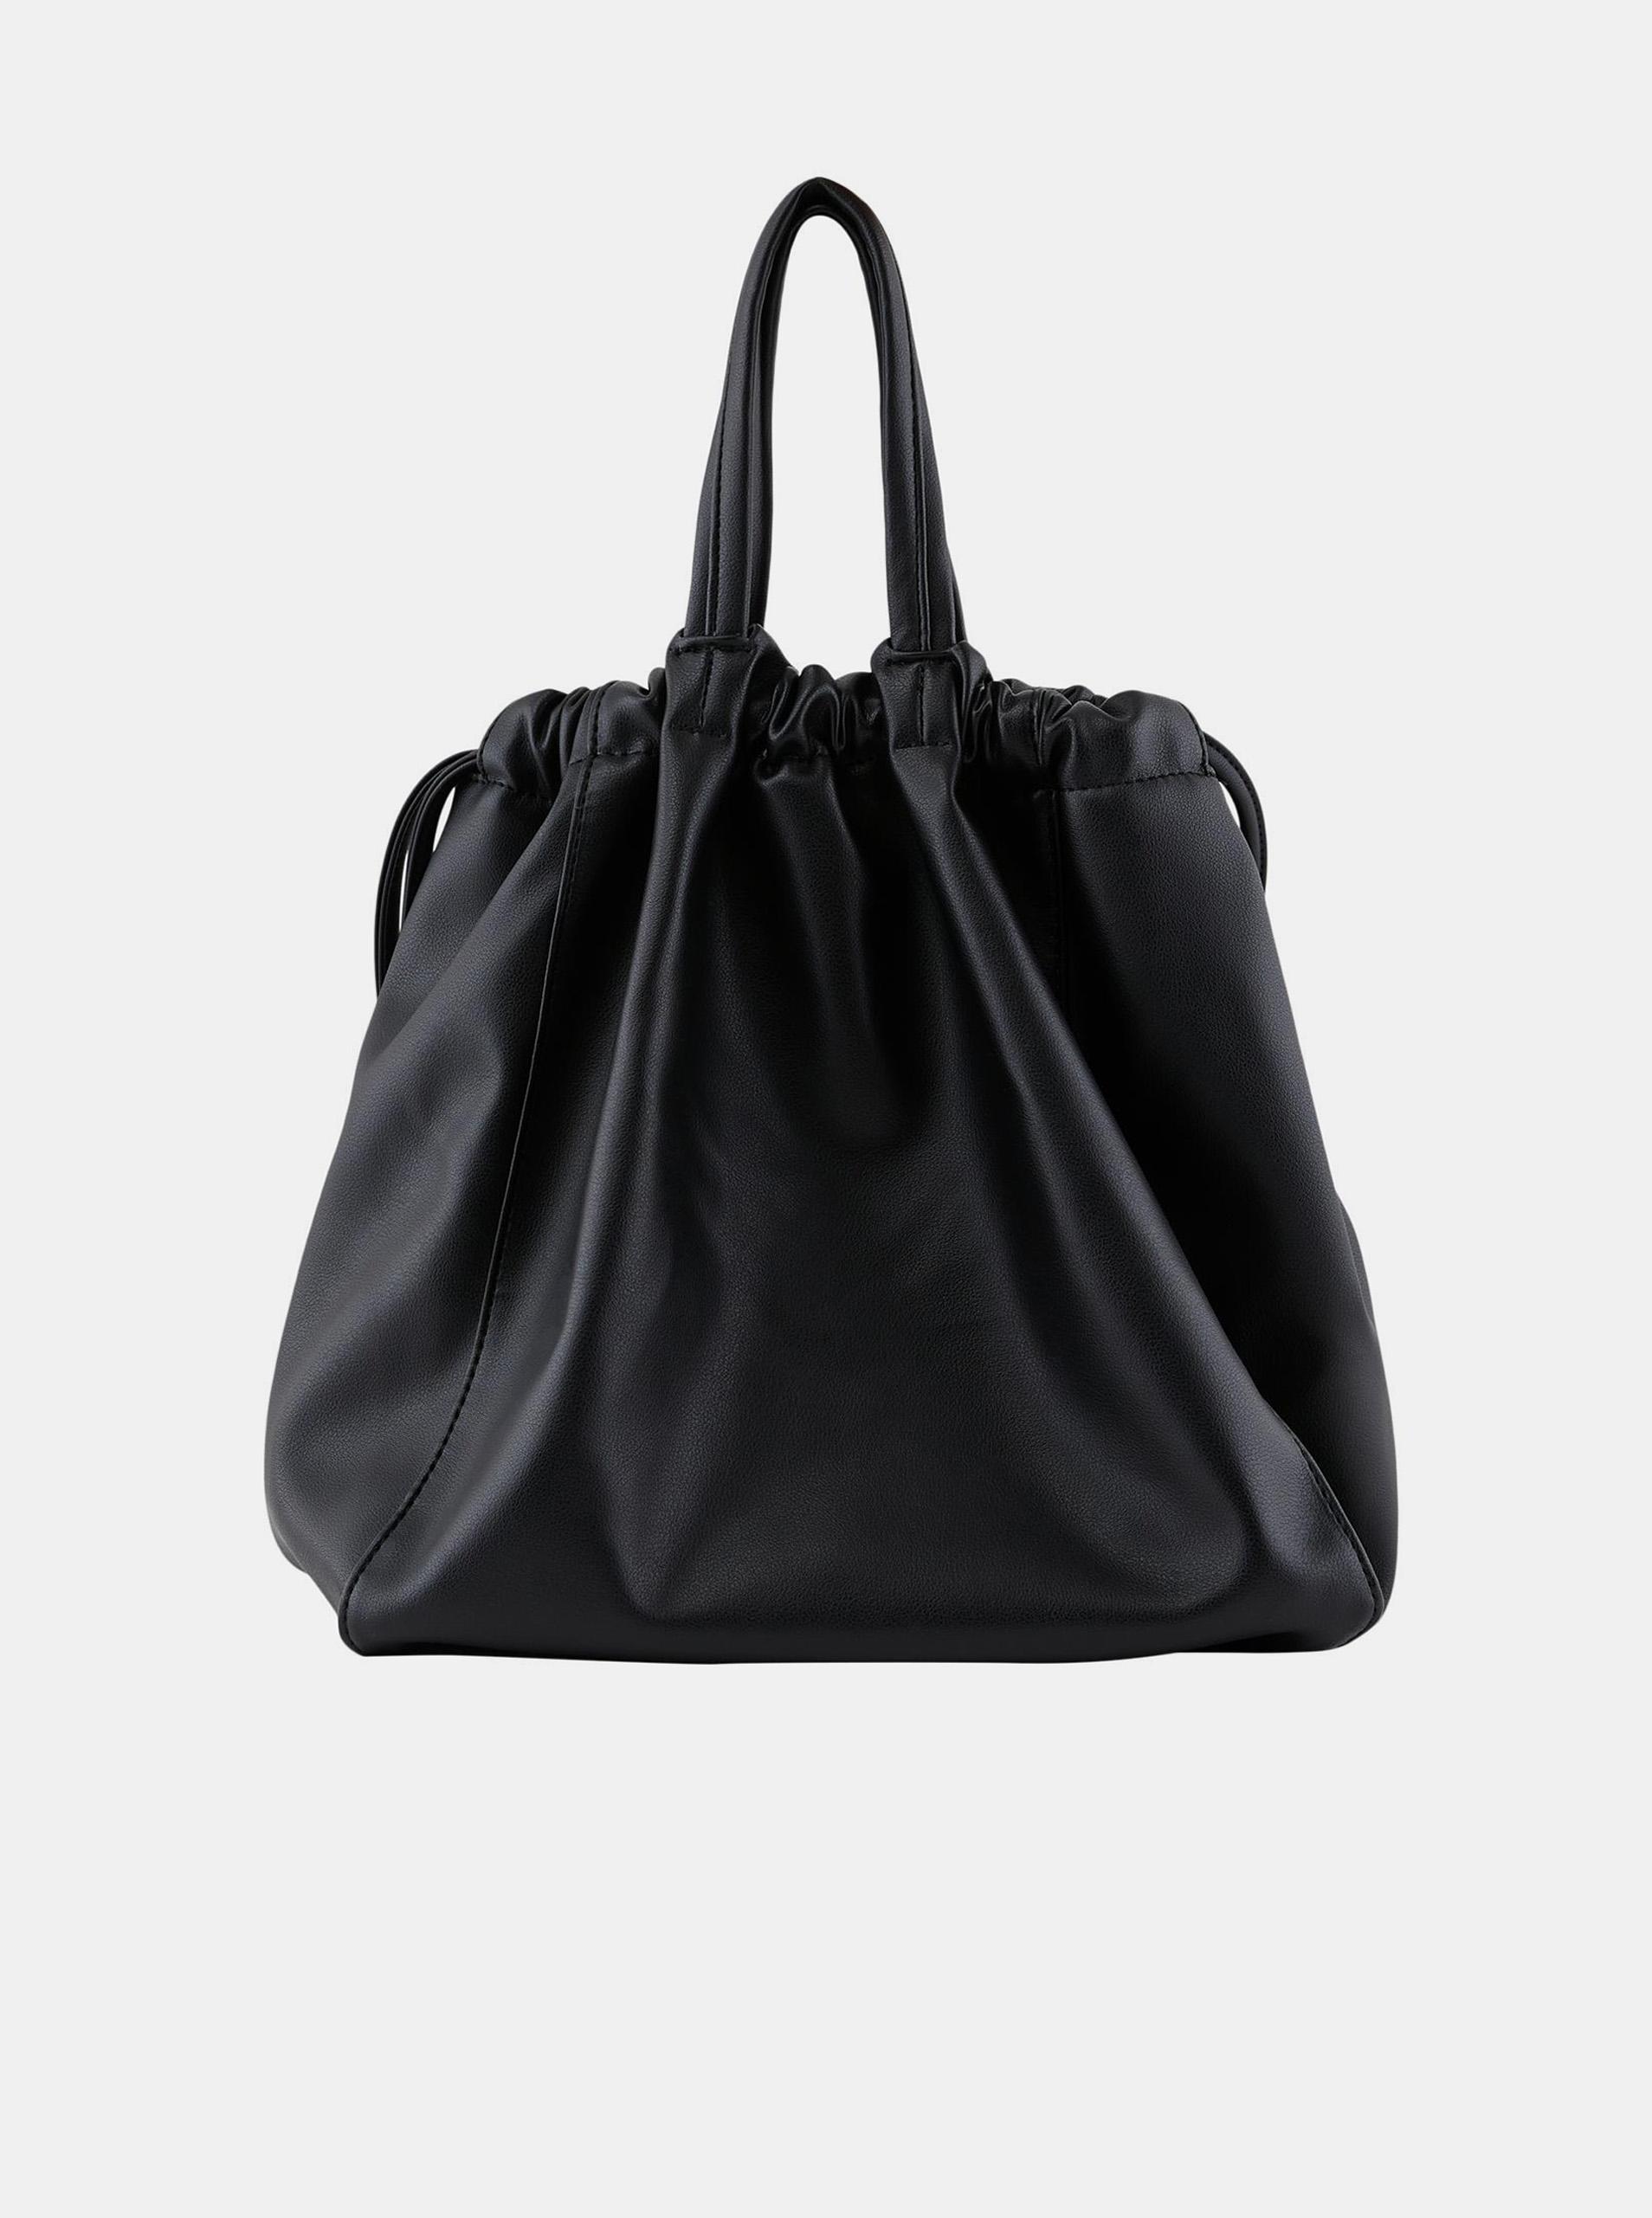 Pieces black drawstring bag Talli